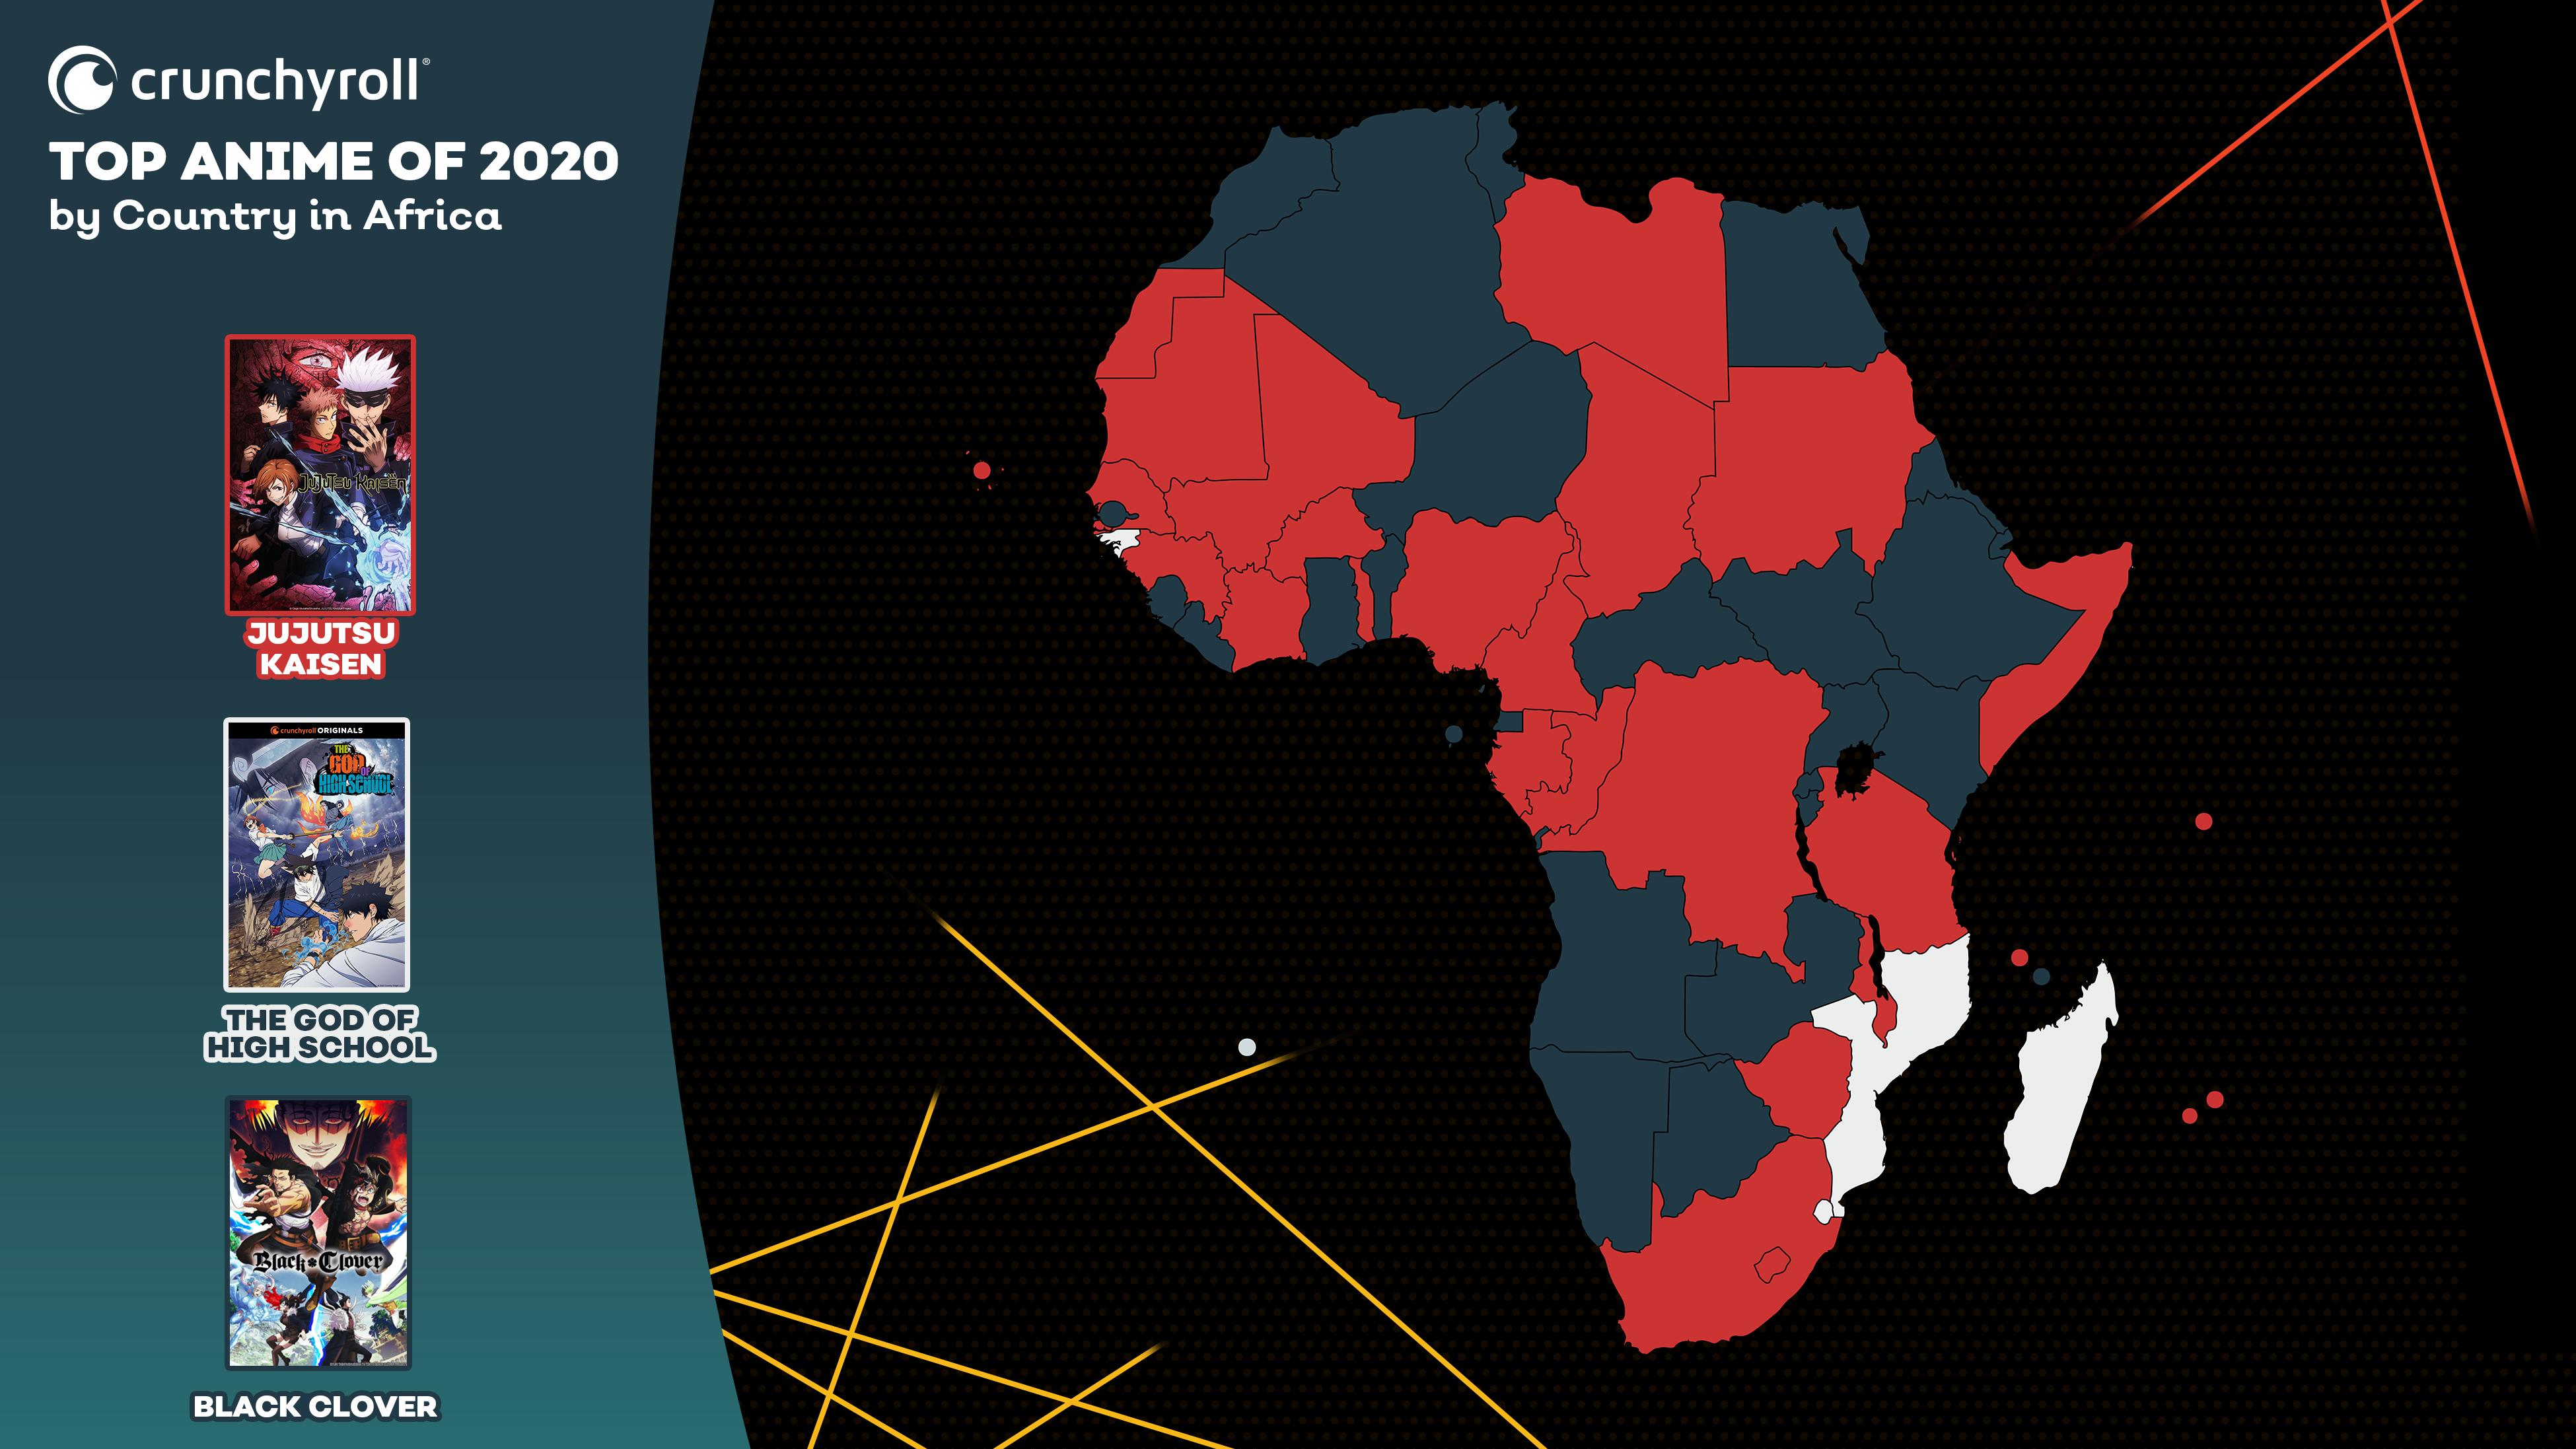 Mejor anime de 2020 por país: África